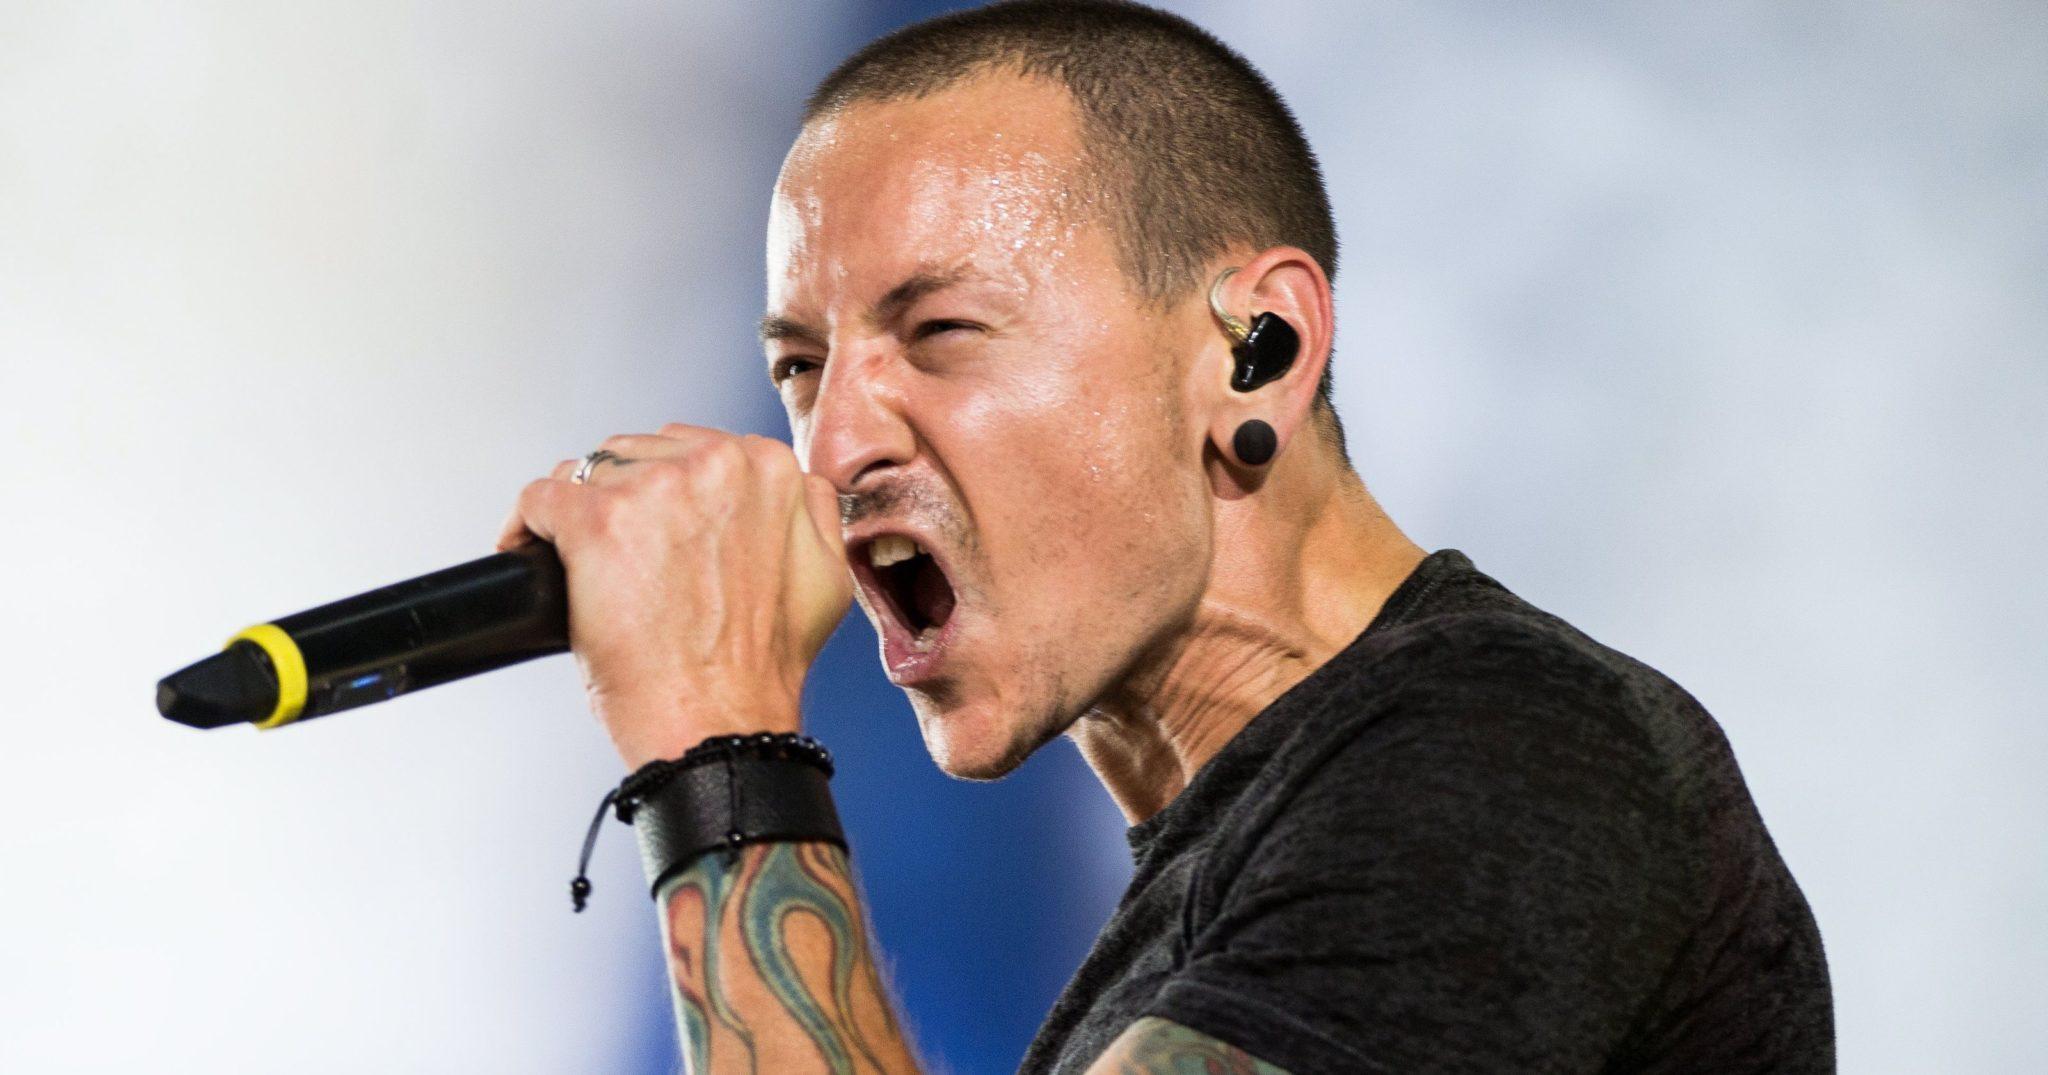 Linkin park singer chester benningtons toxicology report released fandeluxe Images